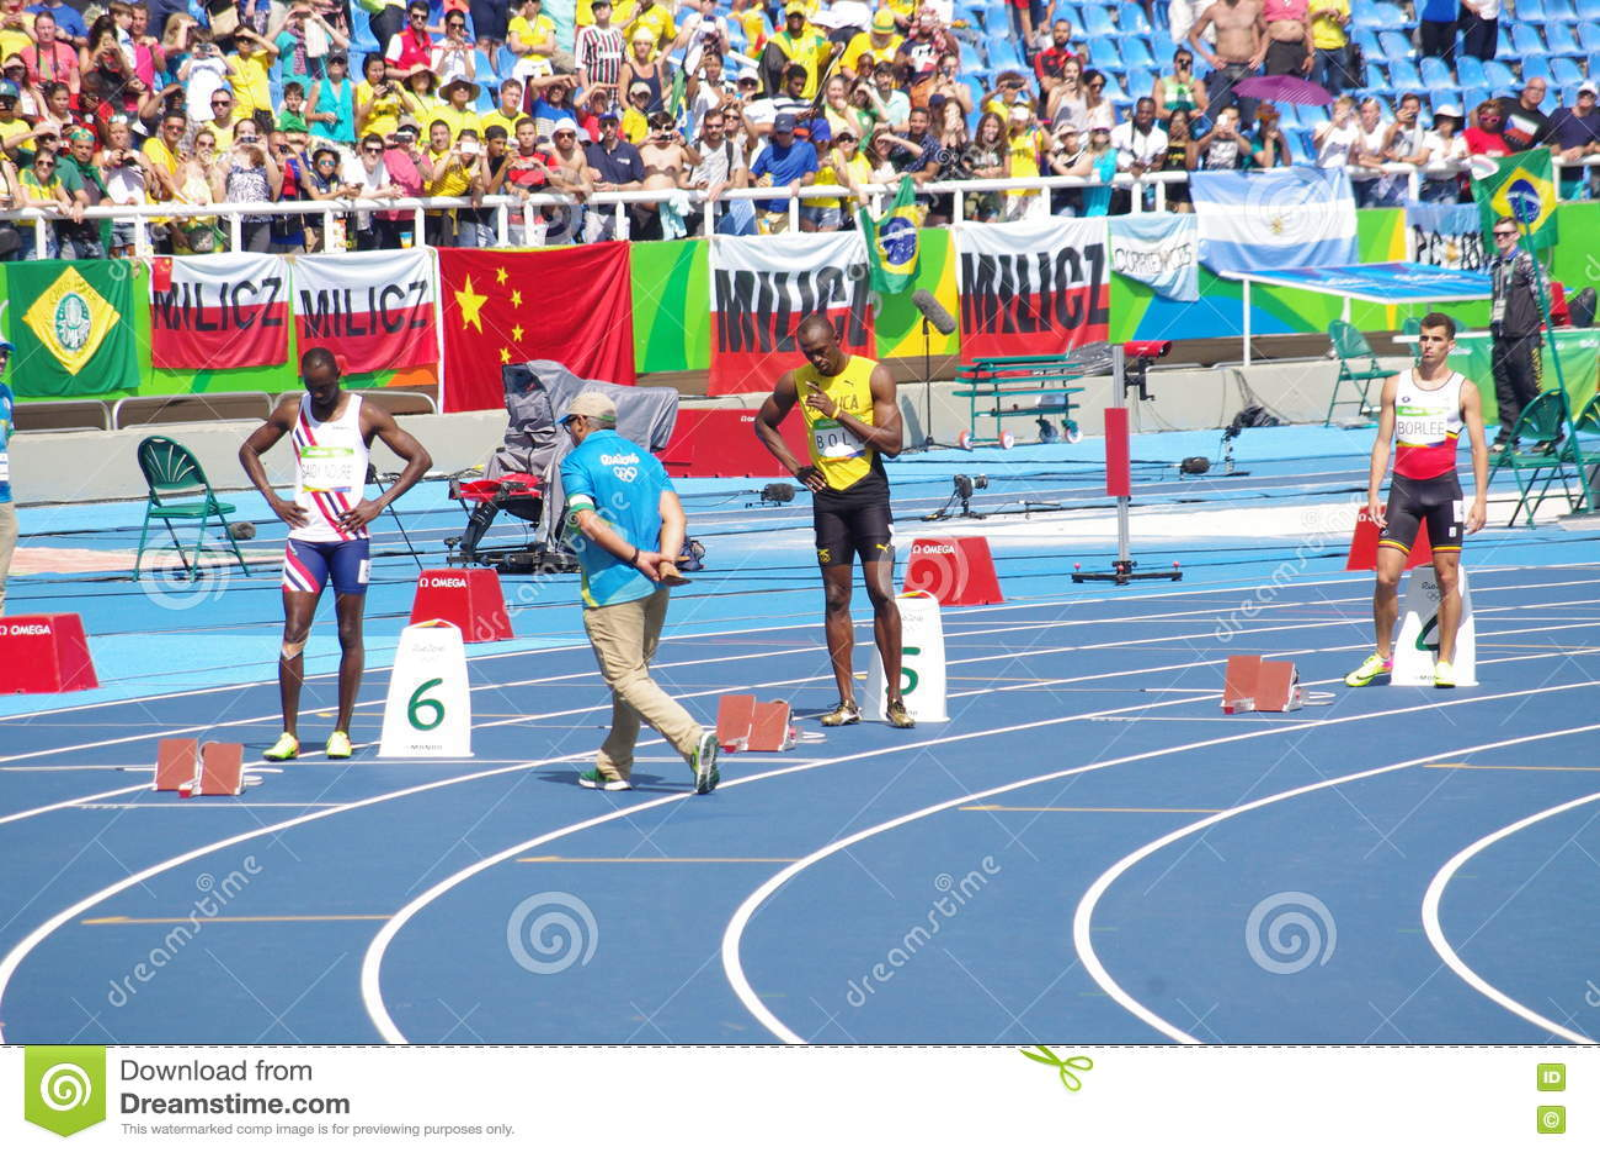 Olympics start date in Brisbane